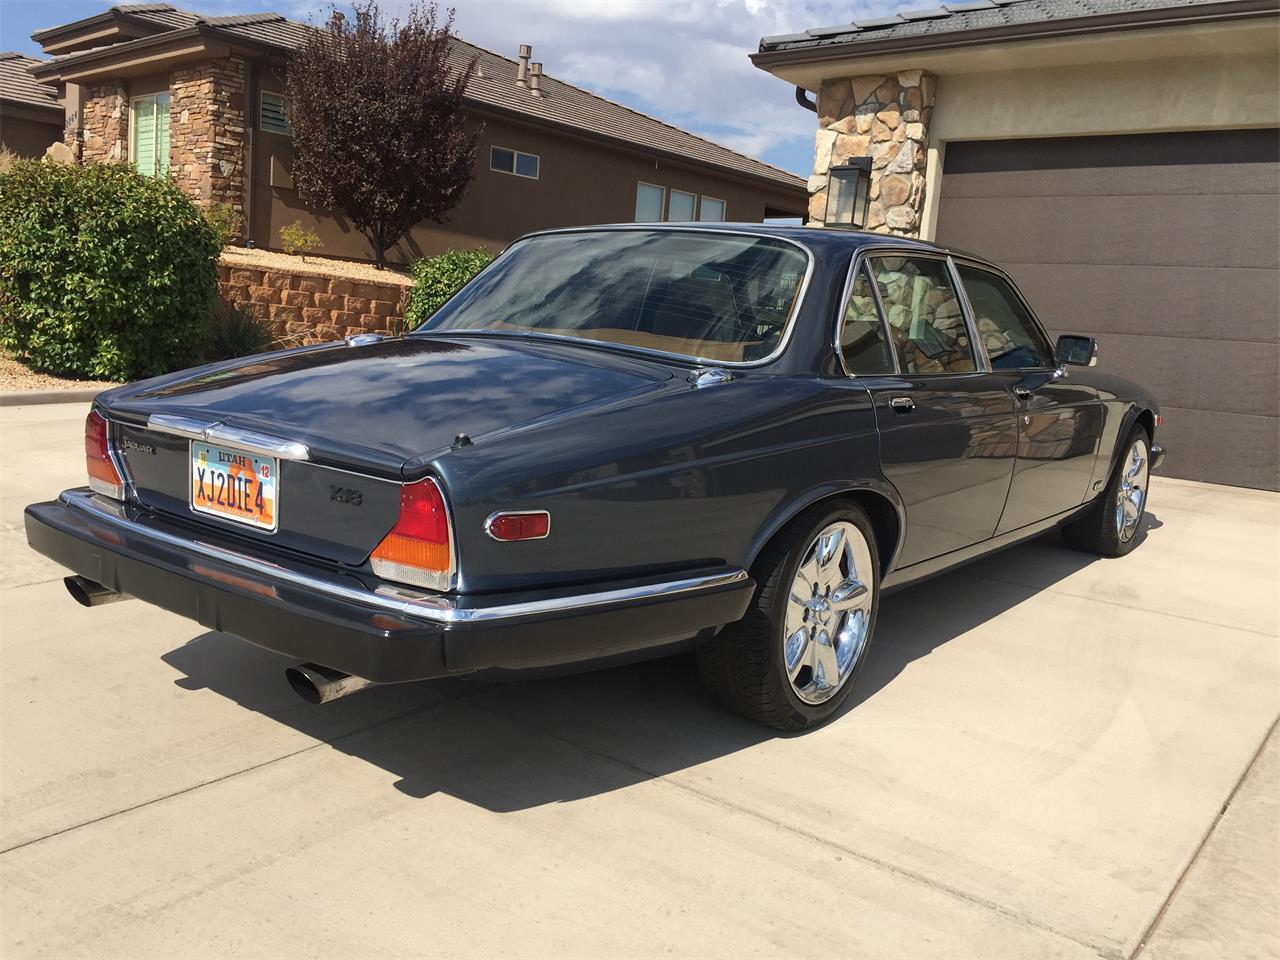 1983 Jaguar XJ6 (CC-1389629) for sale in St. George, Utah